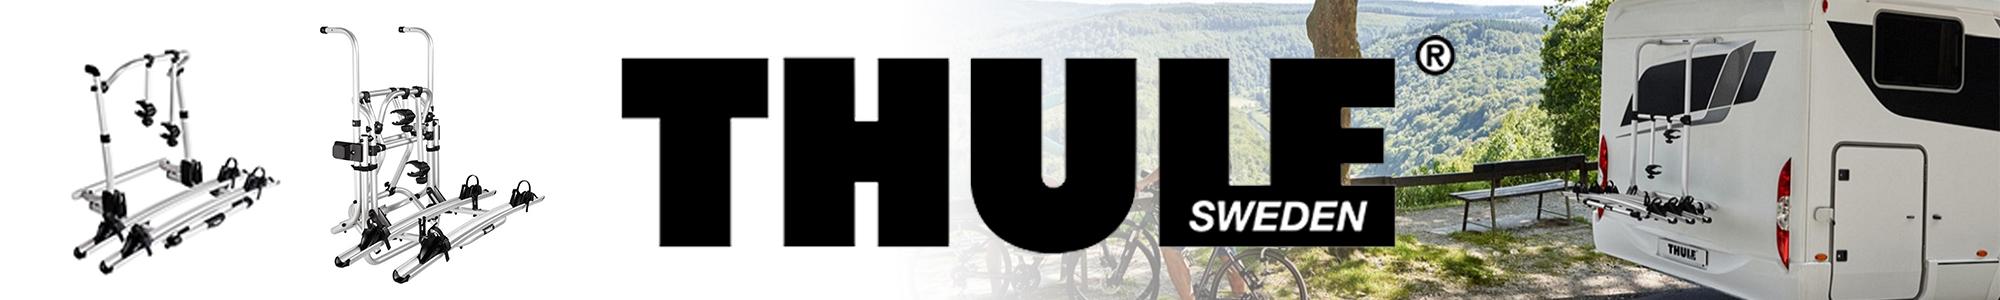 thule camper fietsendrager header cannenburg 2